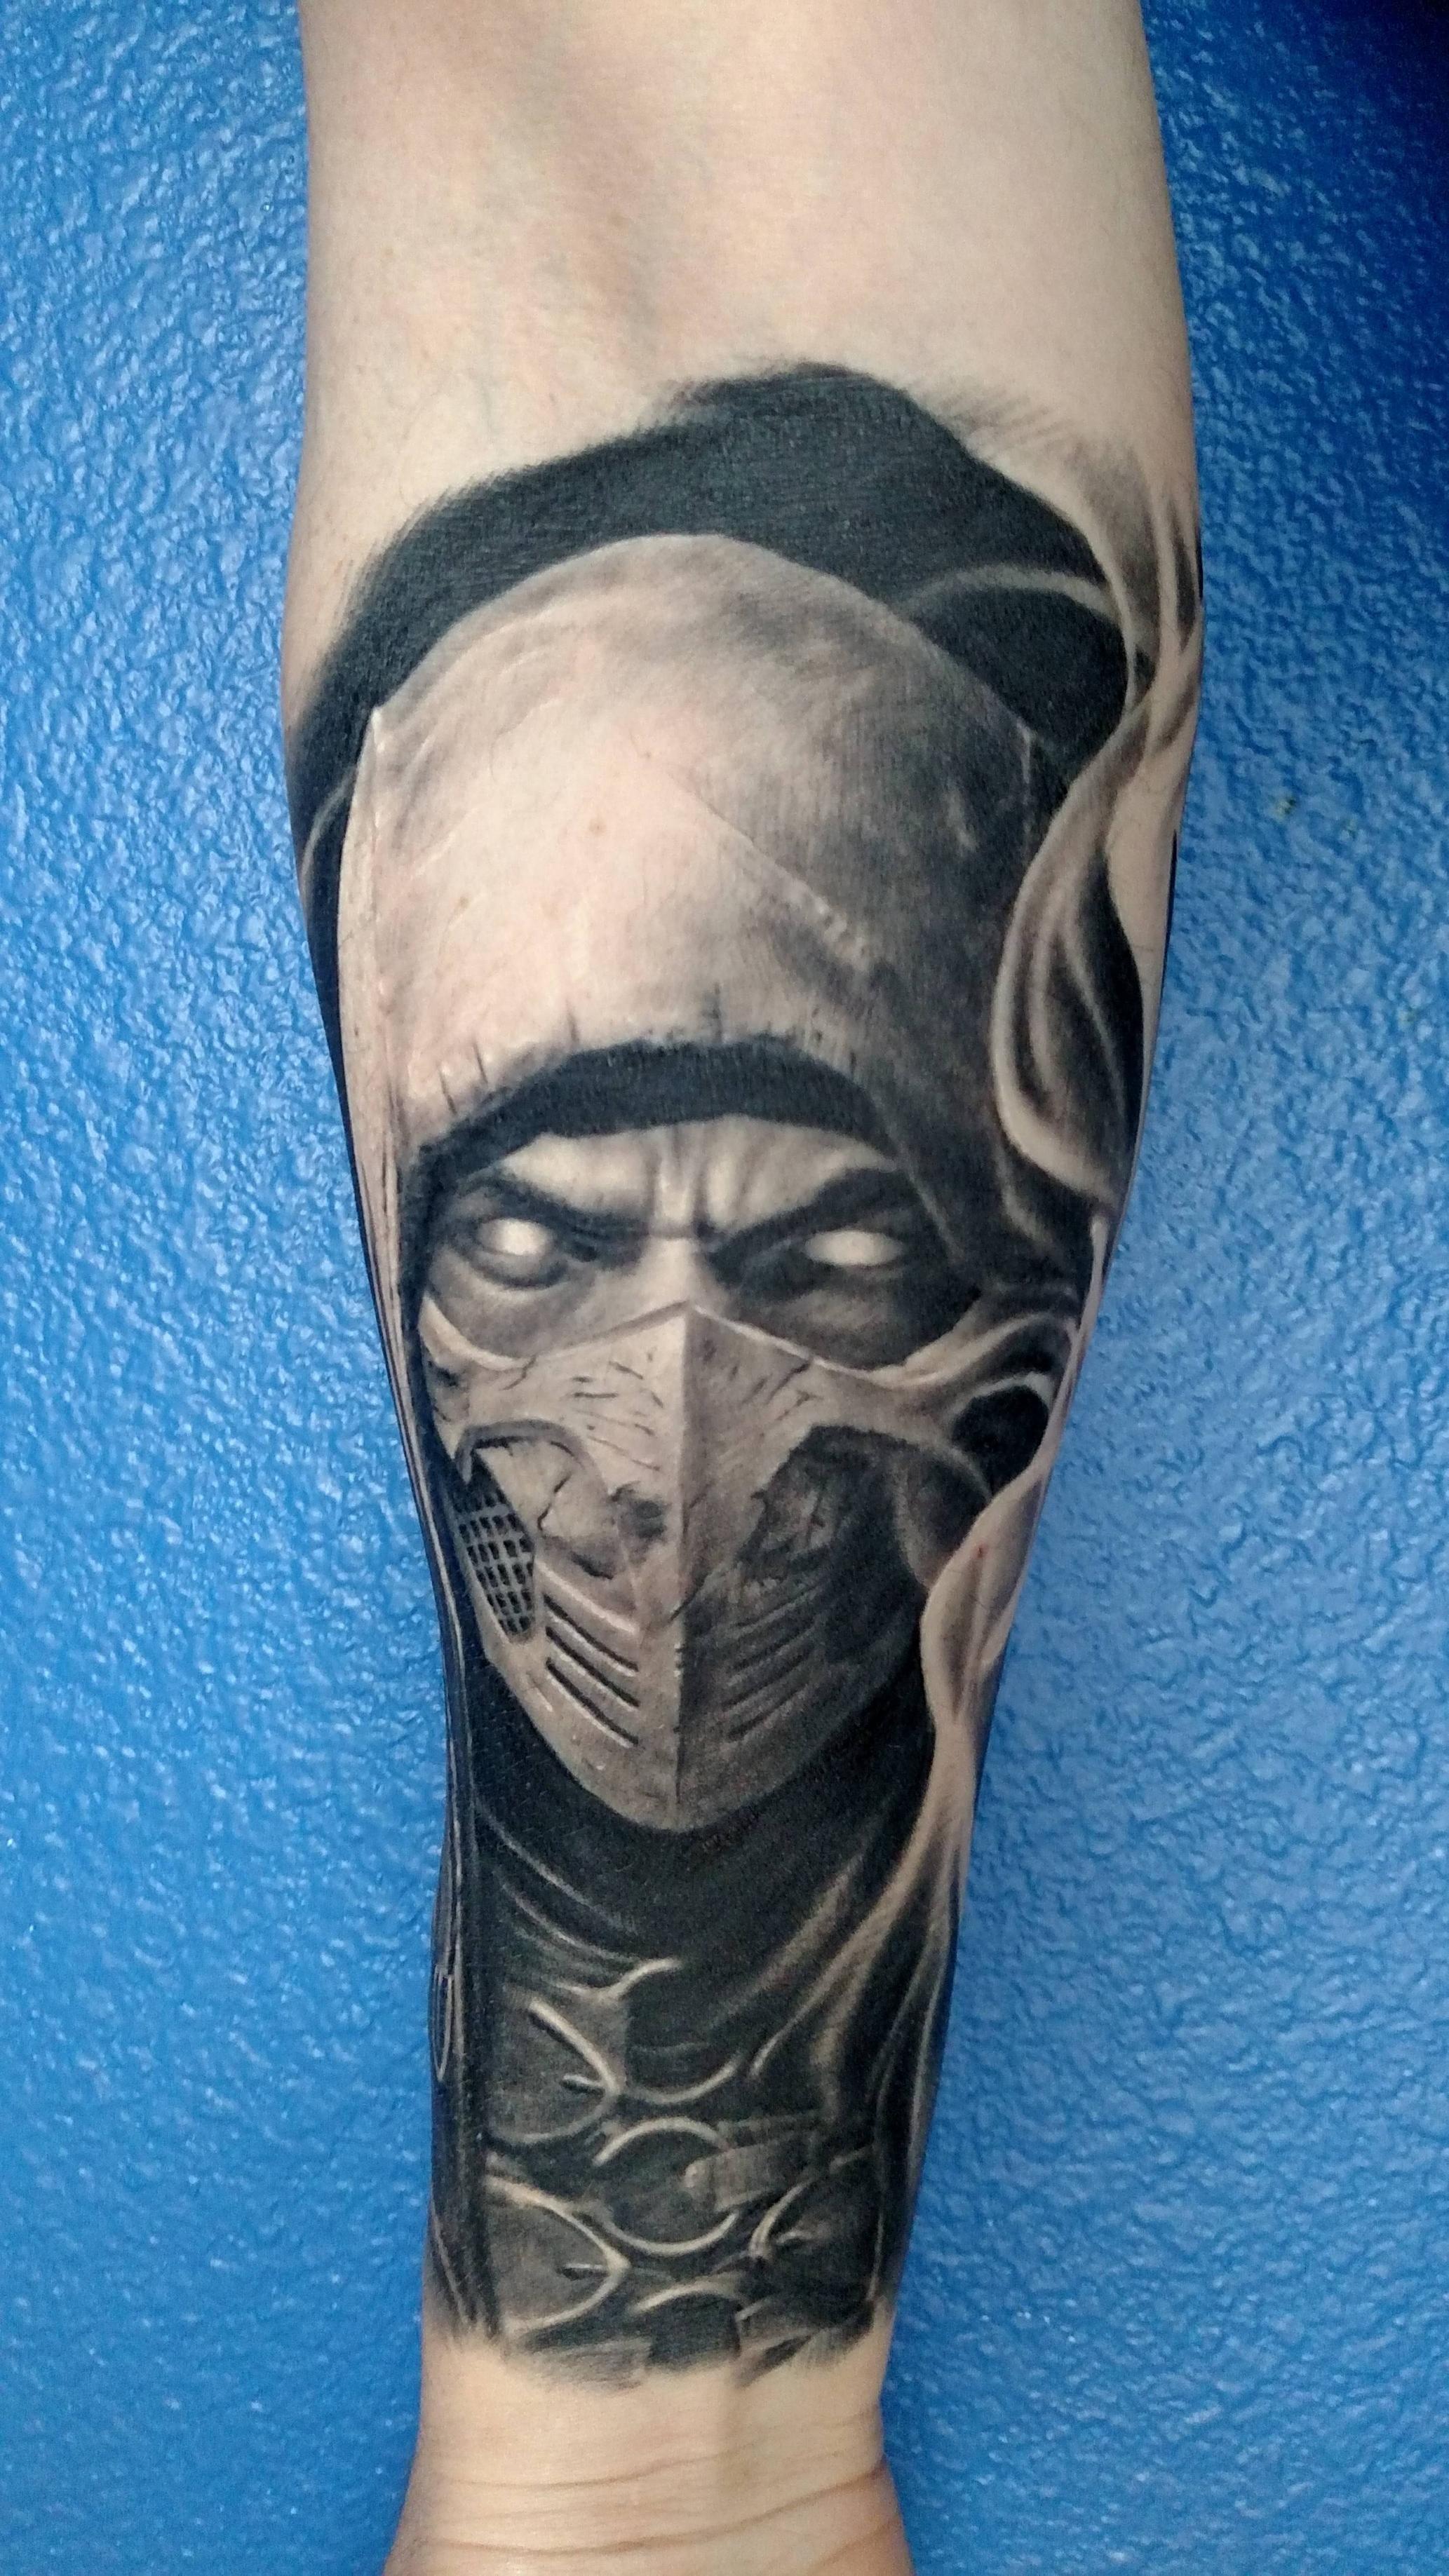 Mortal Kombat Sleeve In Progress Venture Tattoo In Chicago Com